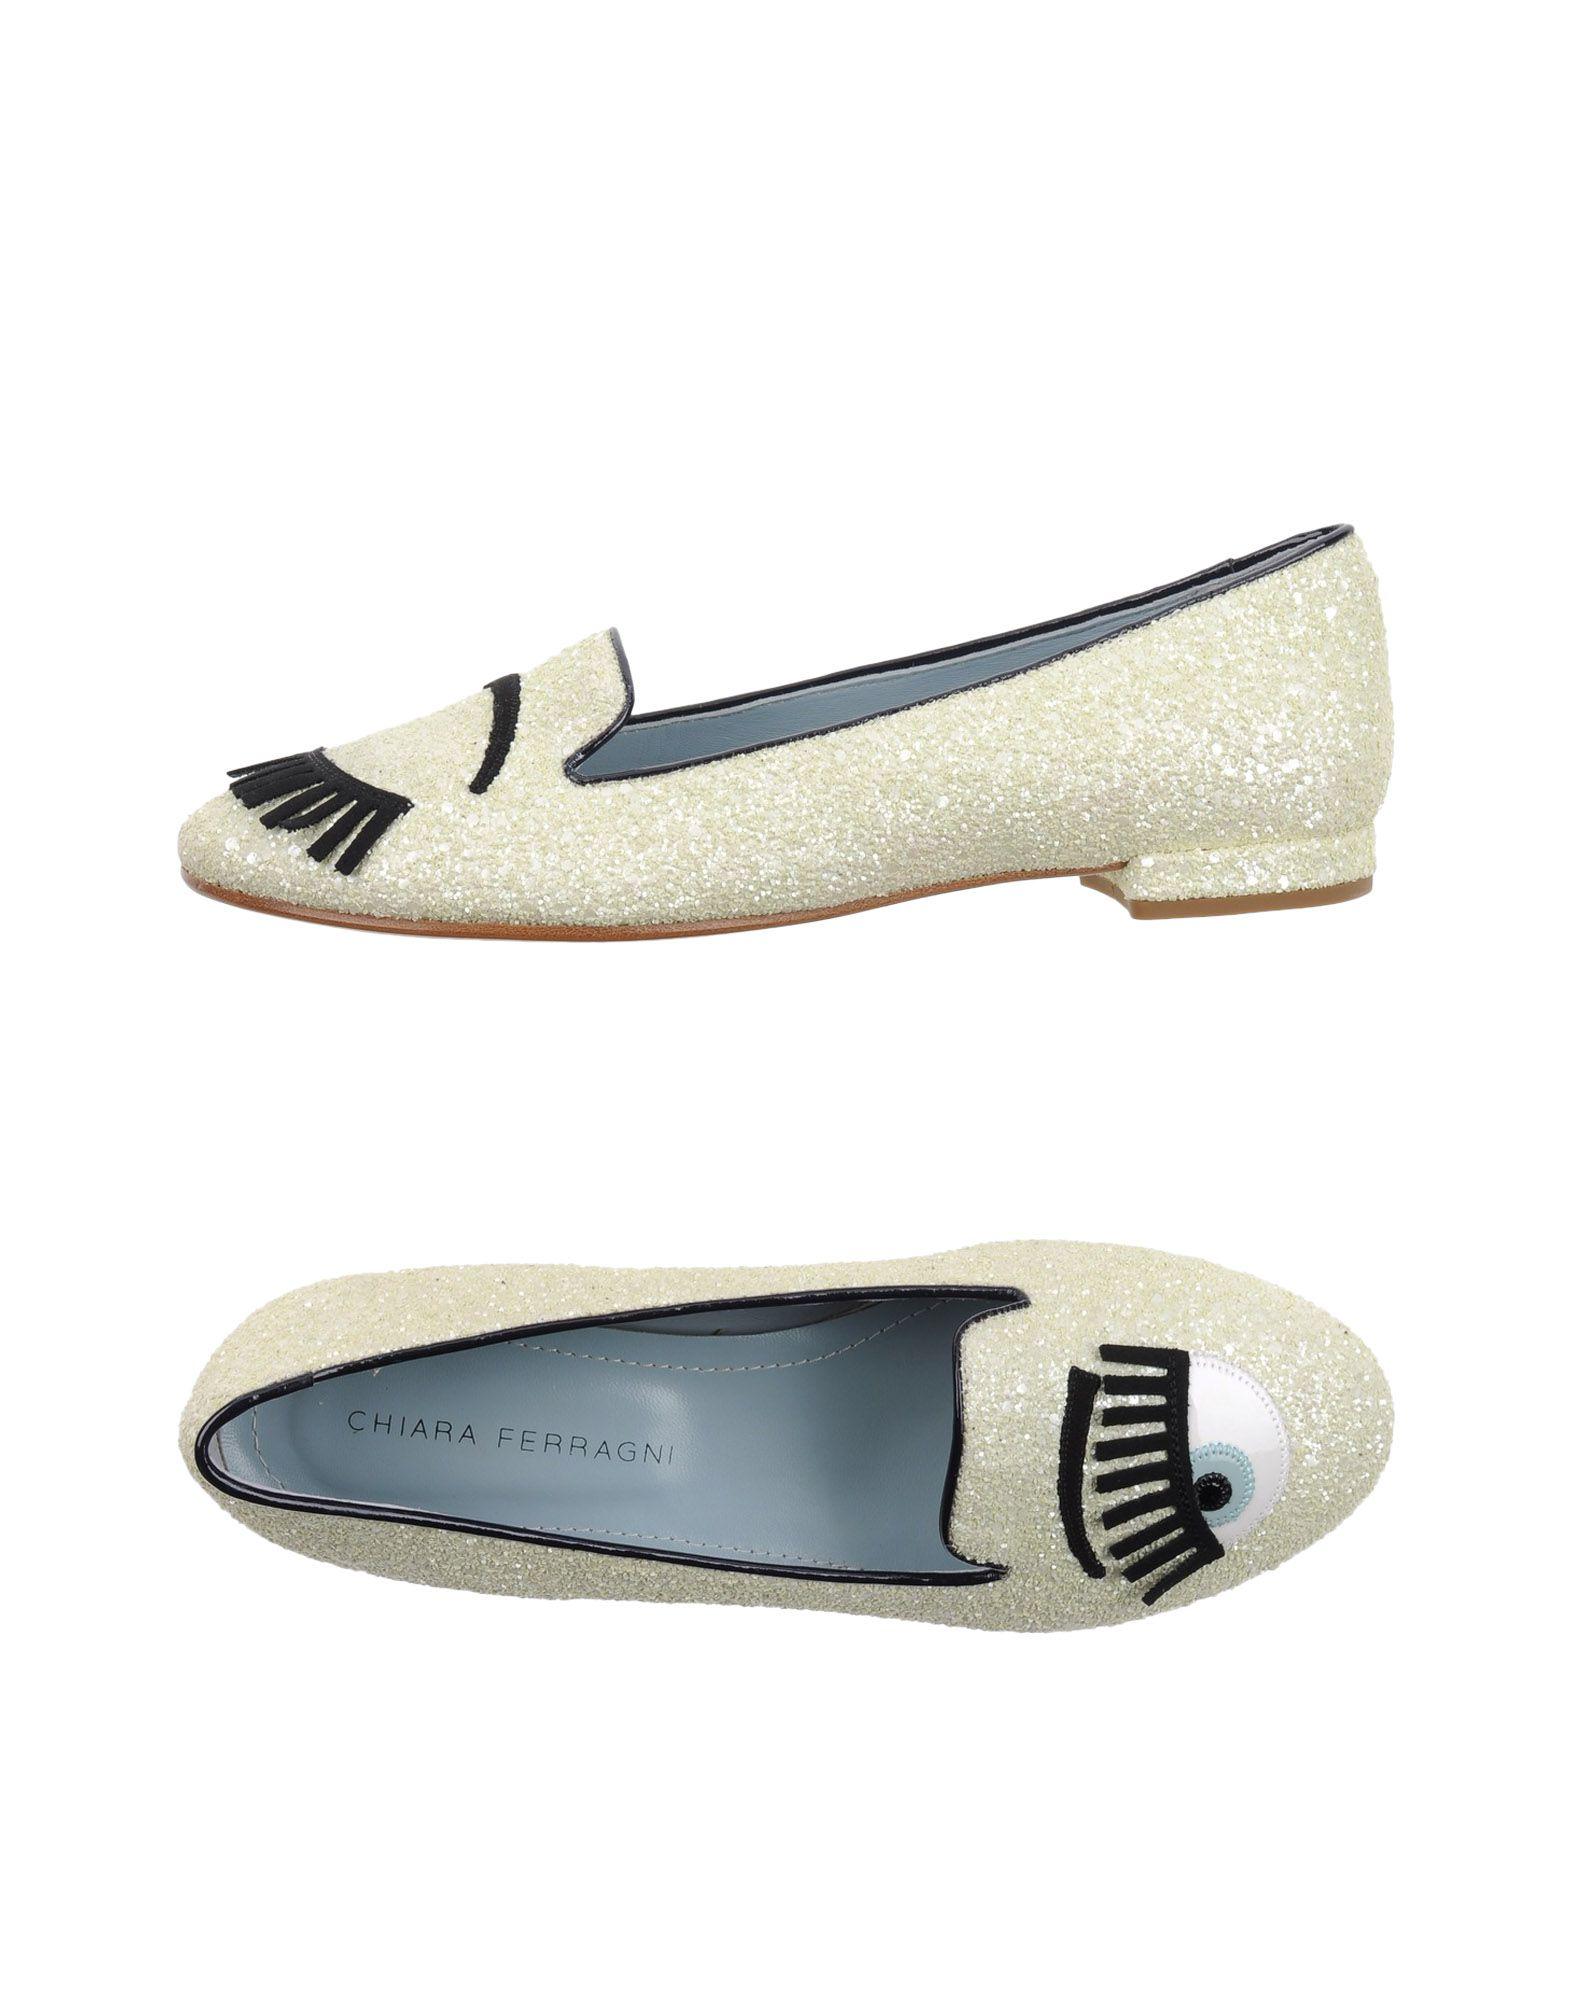 Stilvolle billige Schuhe Damen Chiara Ferragni Mokassins Damen Schuhe  11131333MA 9bd328